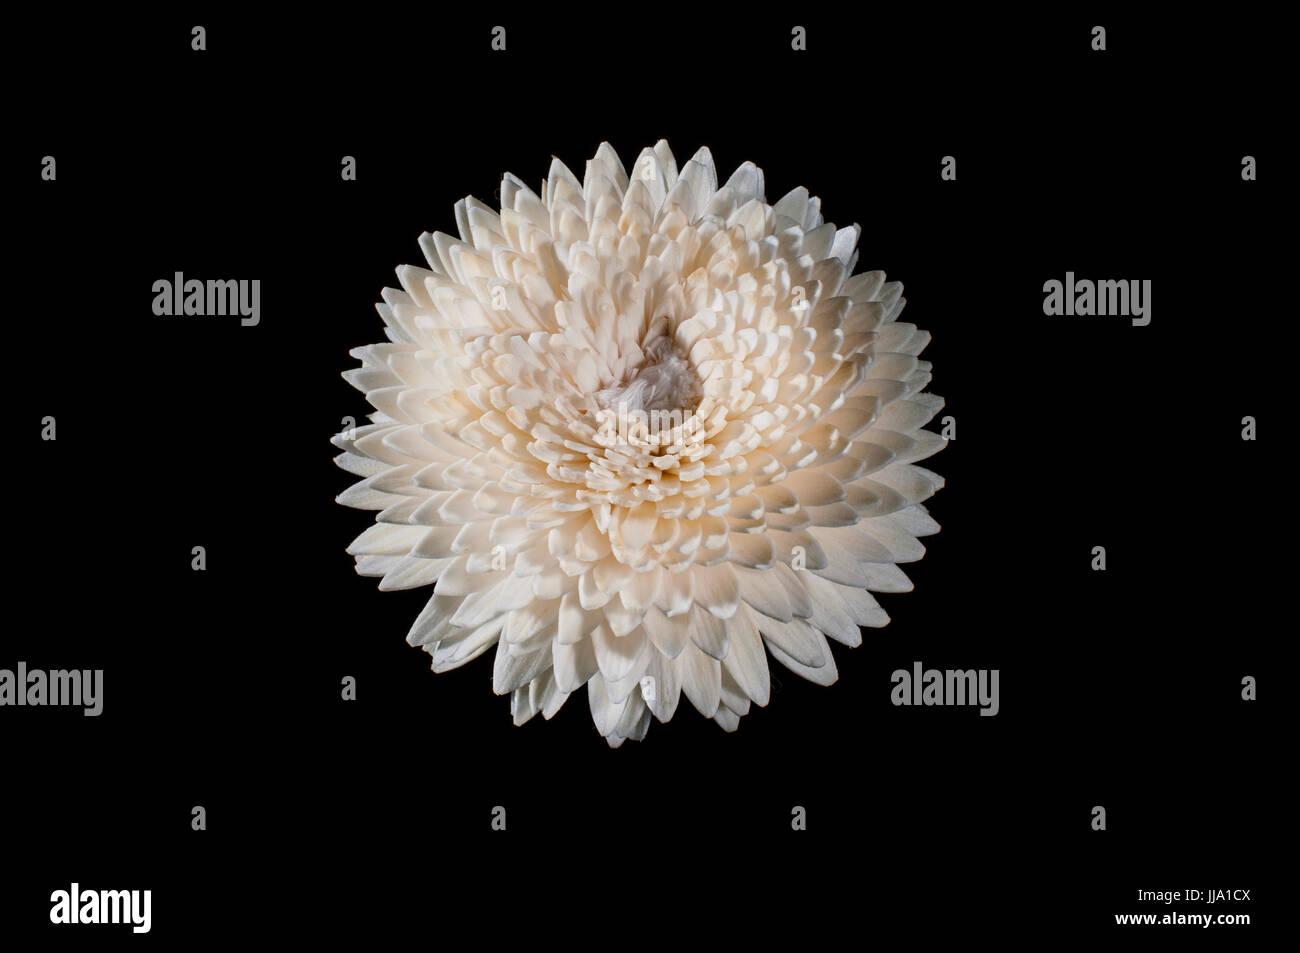 White flowers on black background - Stock Image